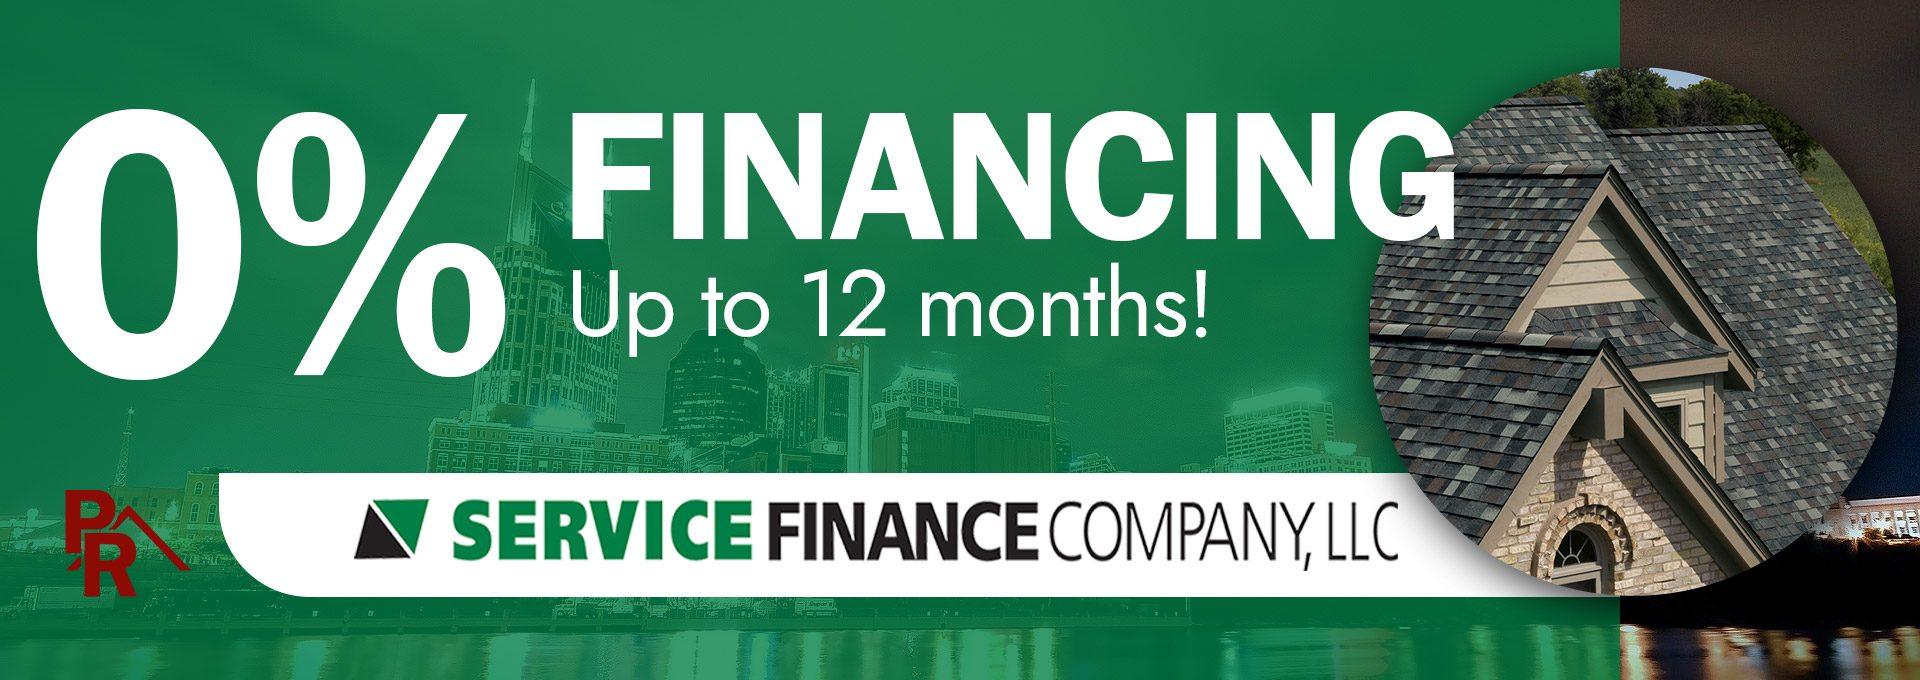 Service Financing LLC Graphic